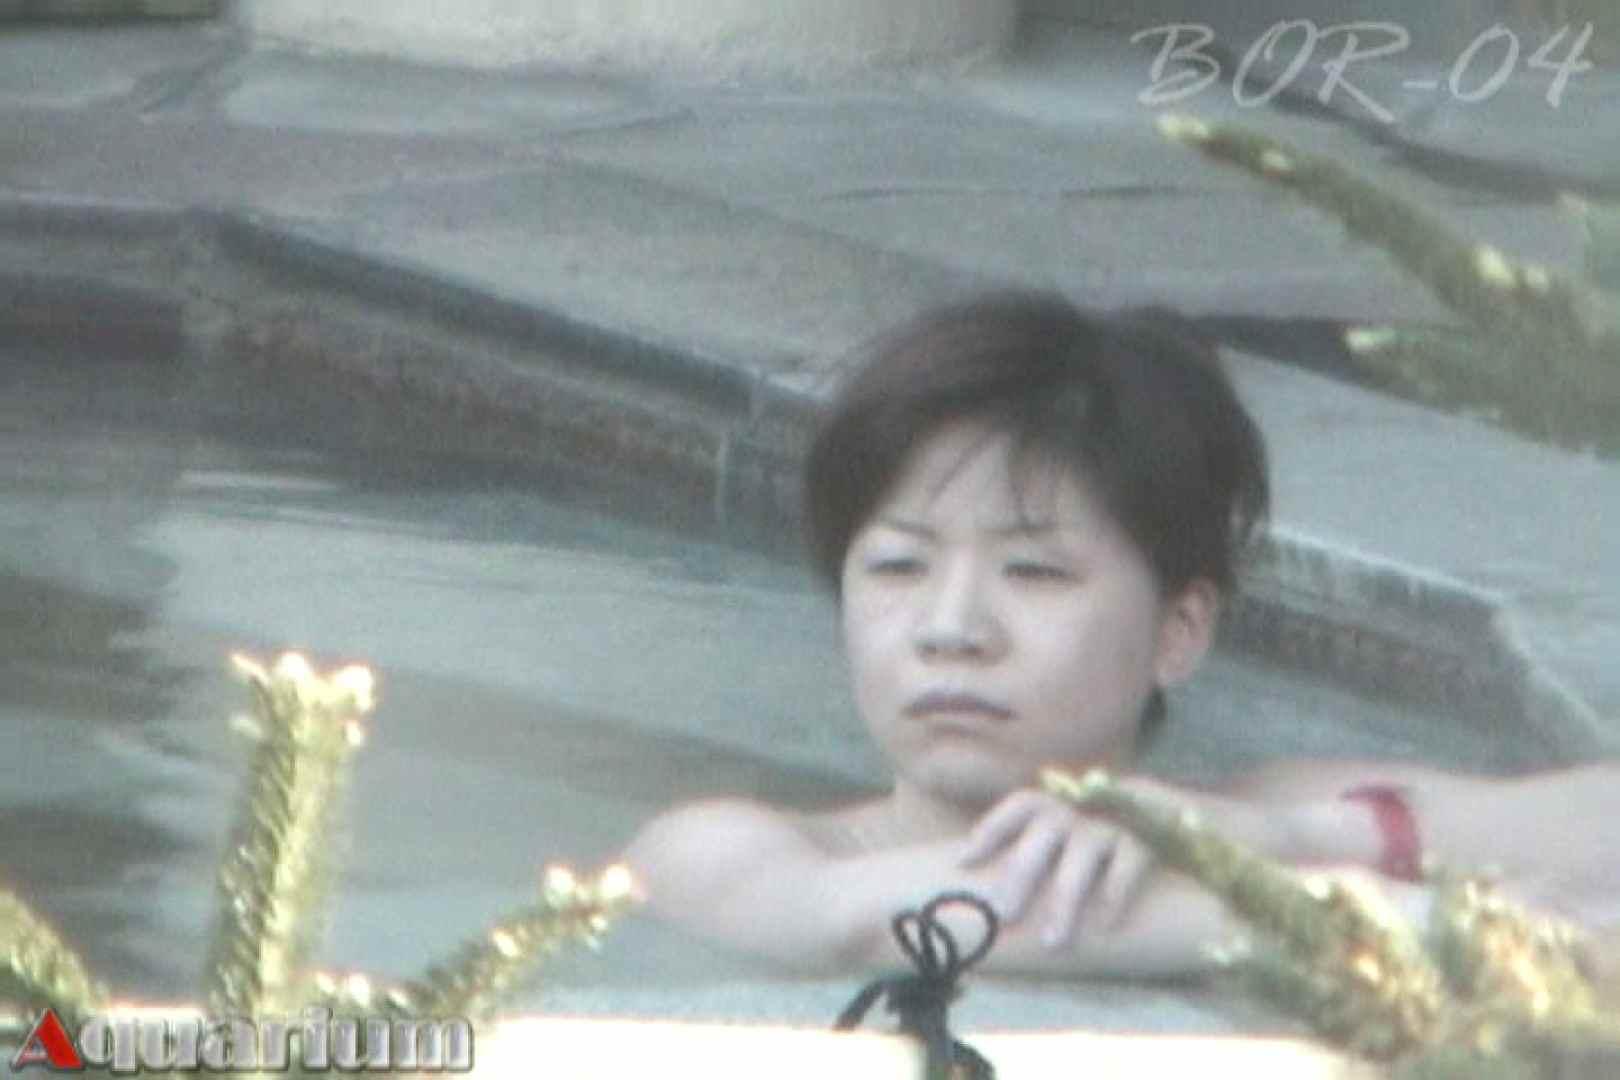 Aquaな露天風呂Vol.514 盗撮 | OLセックス  96画像 64